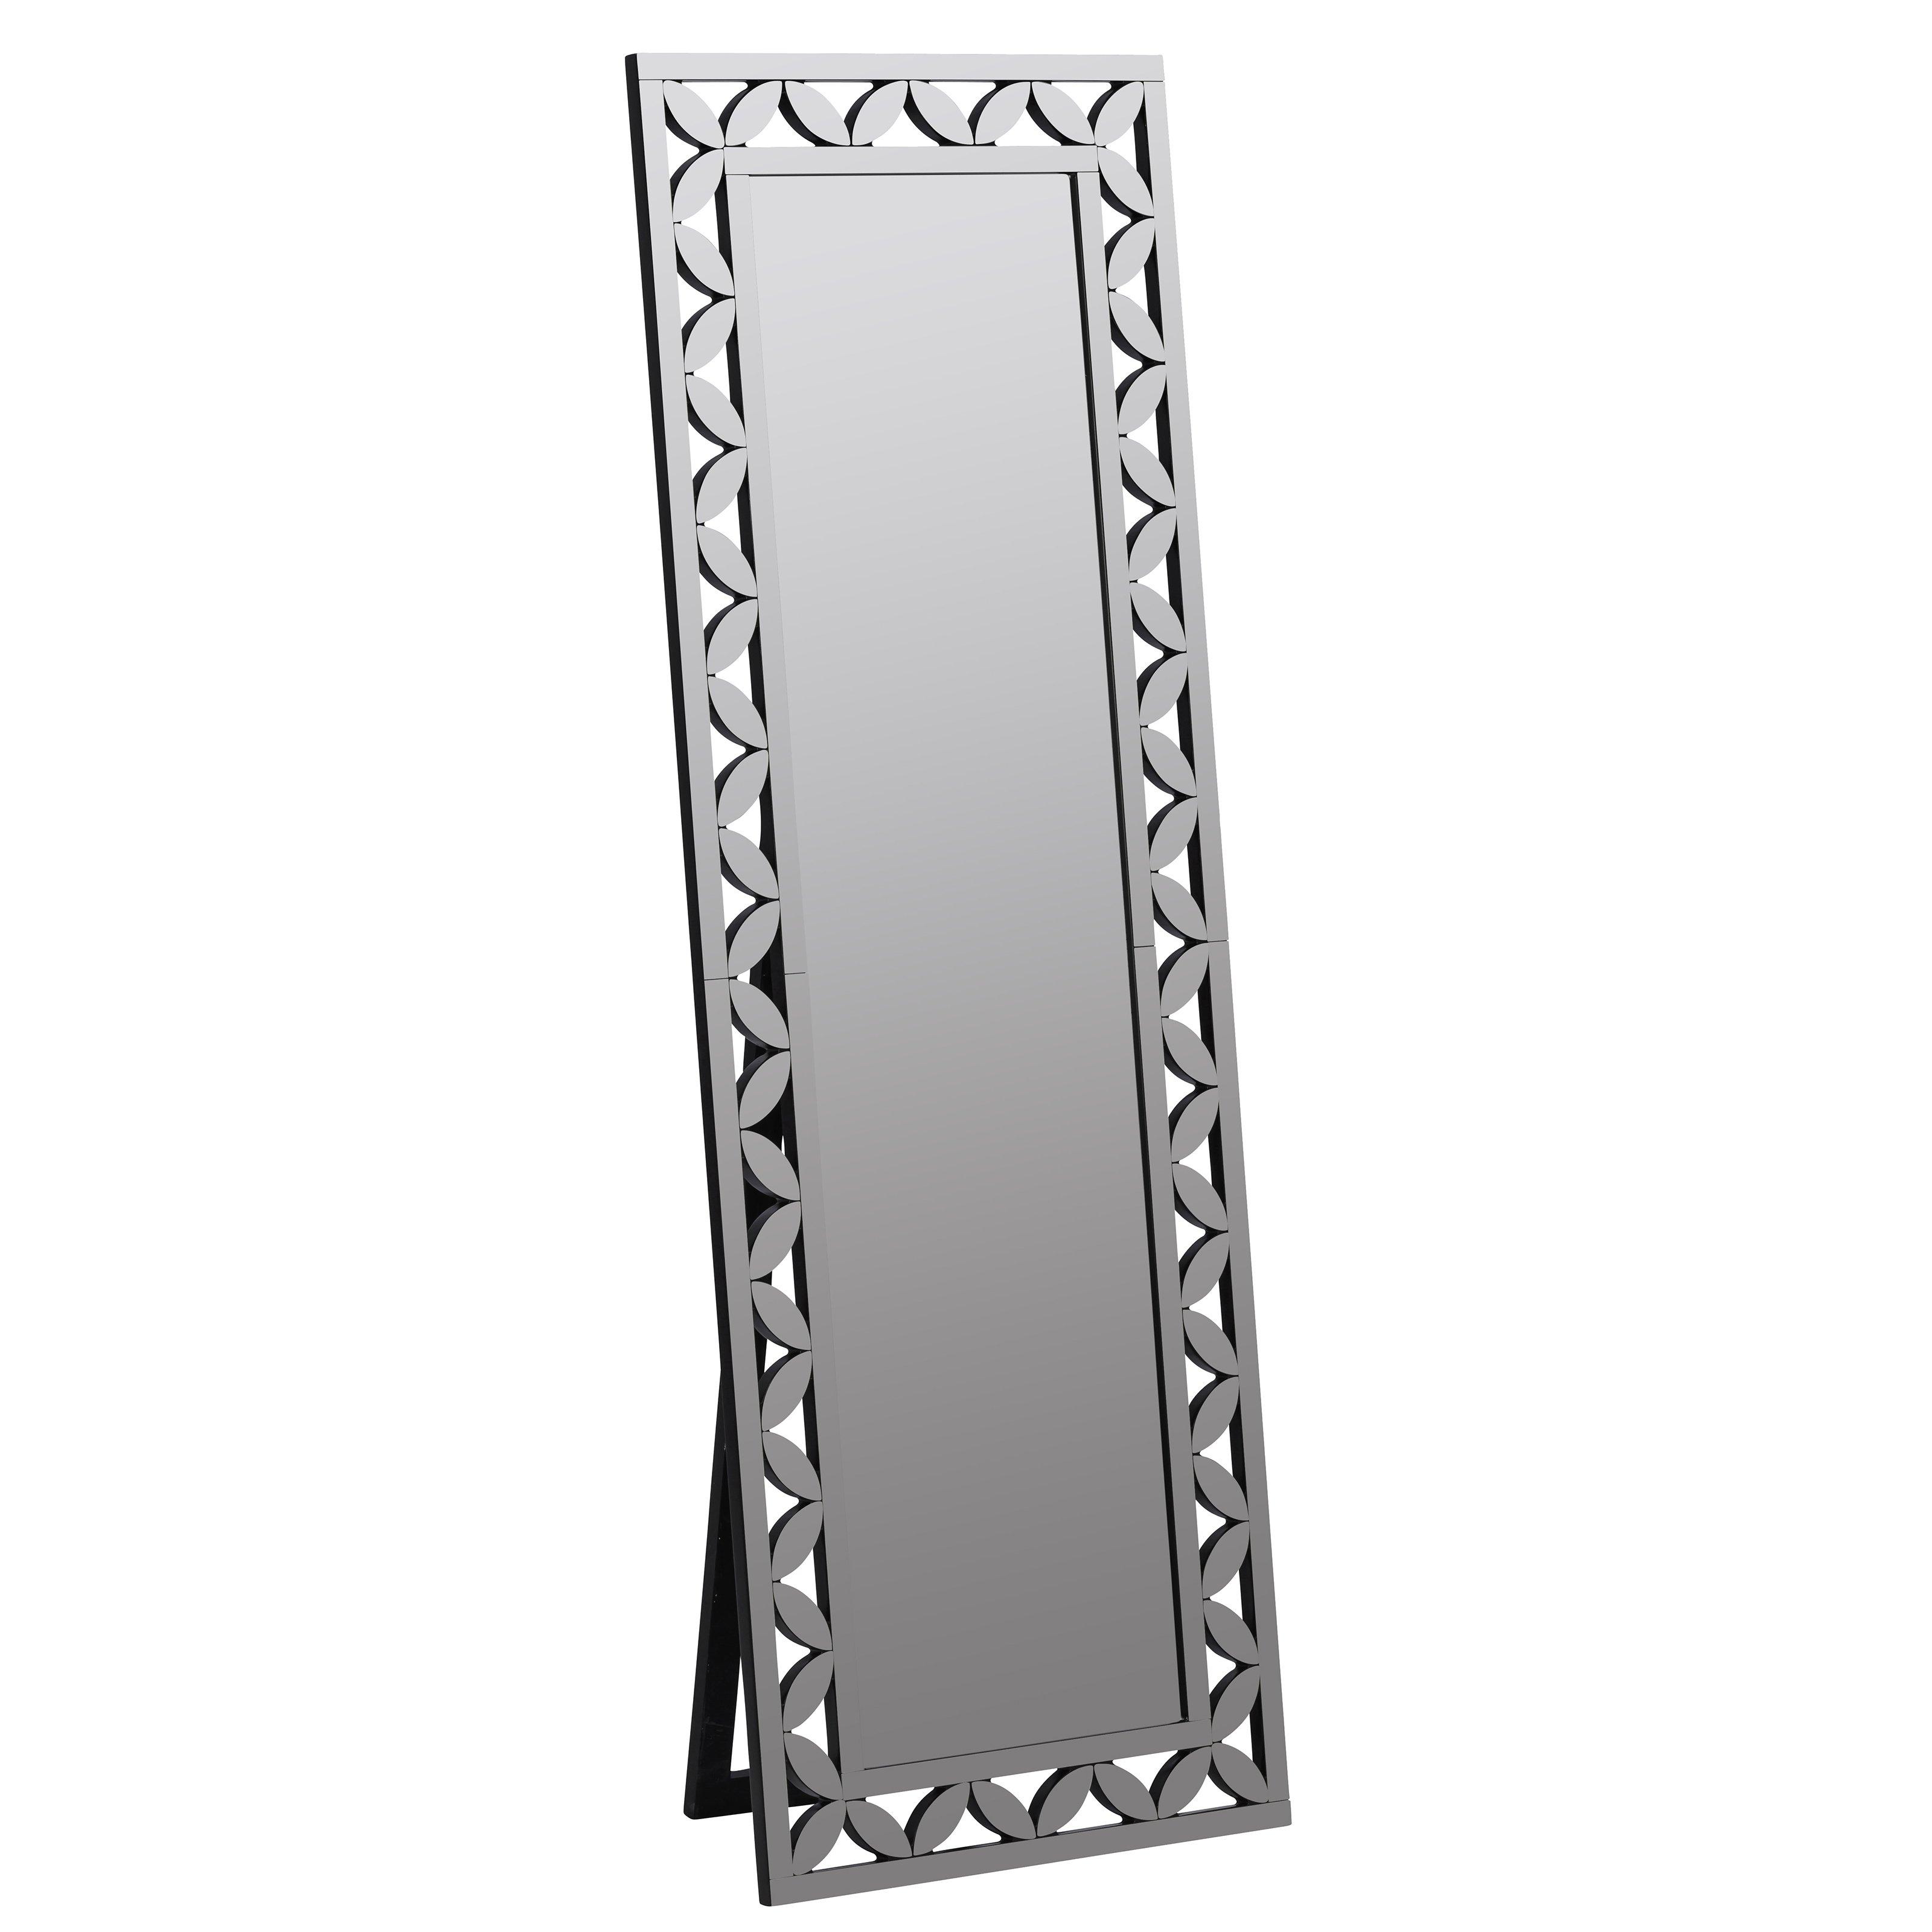 Cooper Classics Warrick Floor Mirror 24W x 68H in. by Cooper Classics